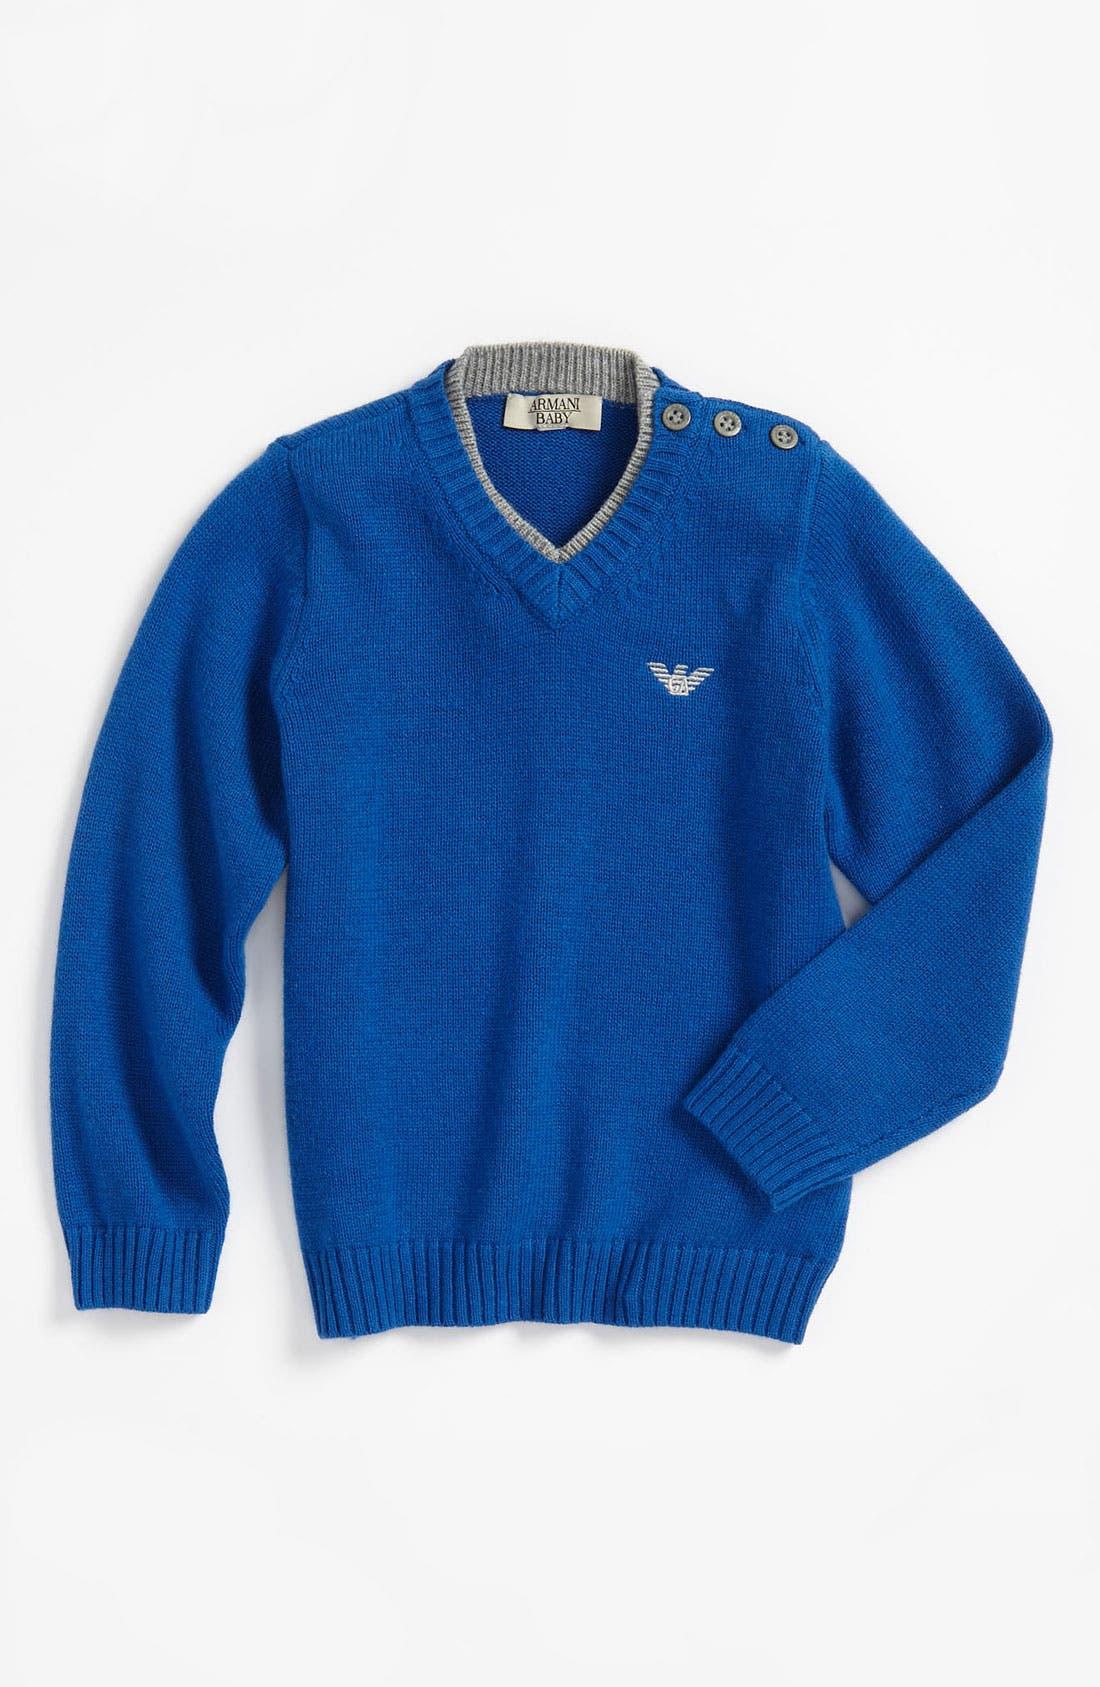 Alternate Image 1 Selected - Armani Junior Sweater (Infant)